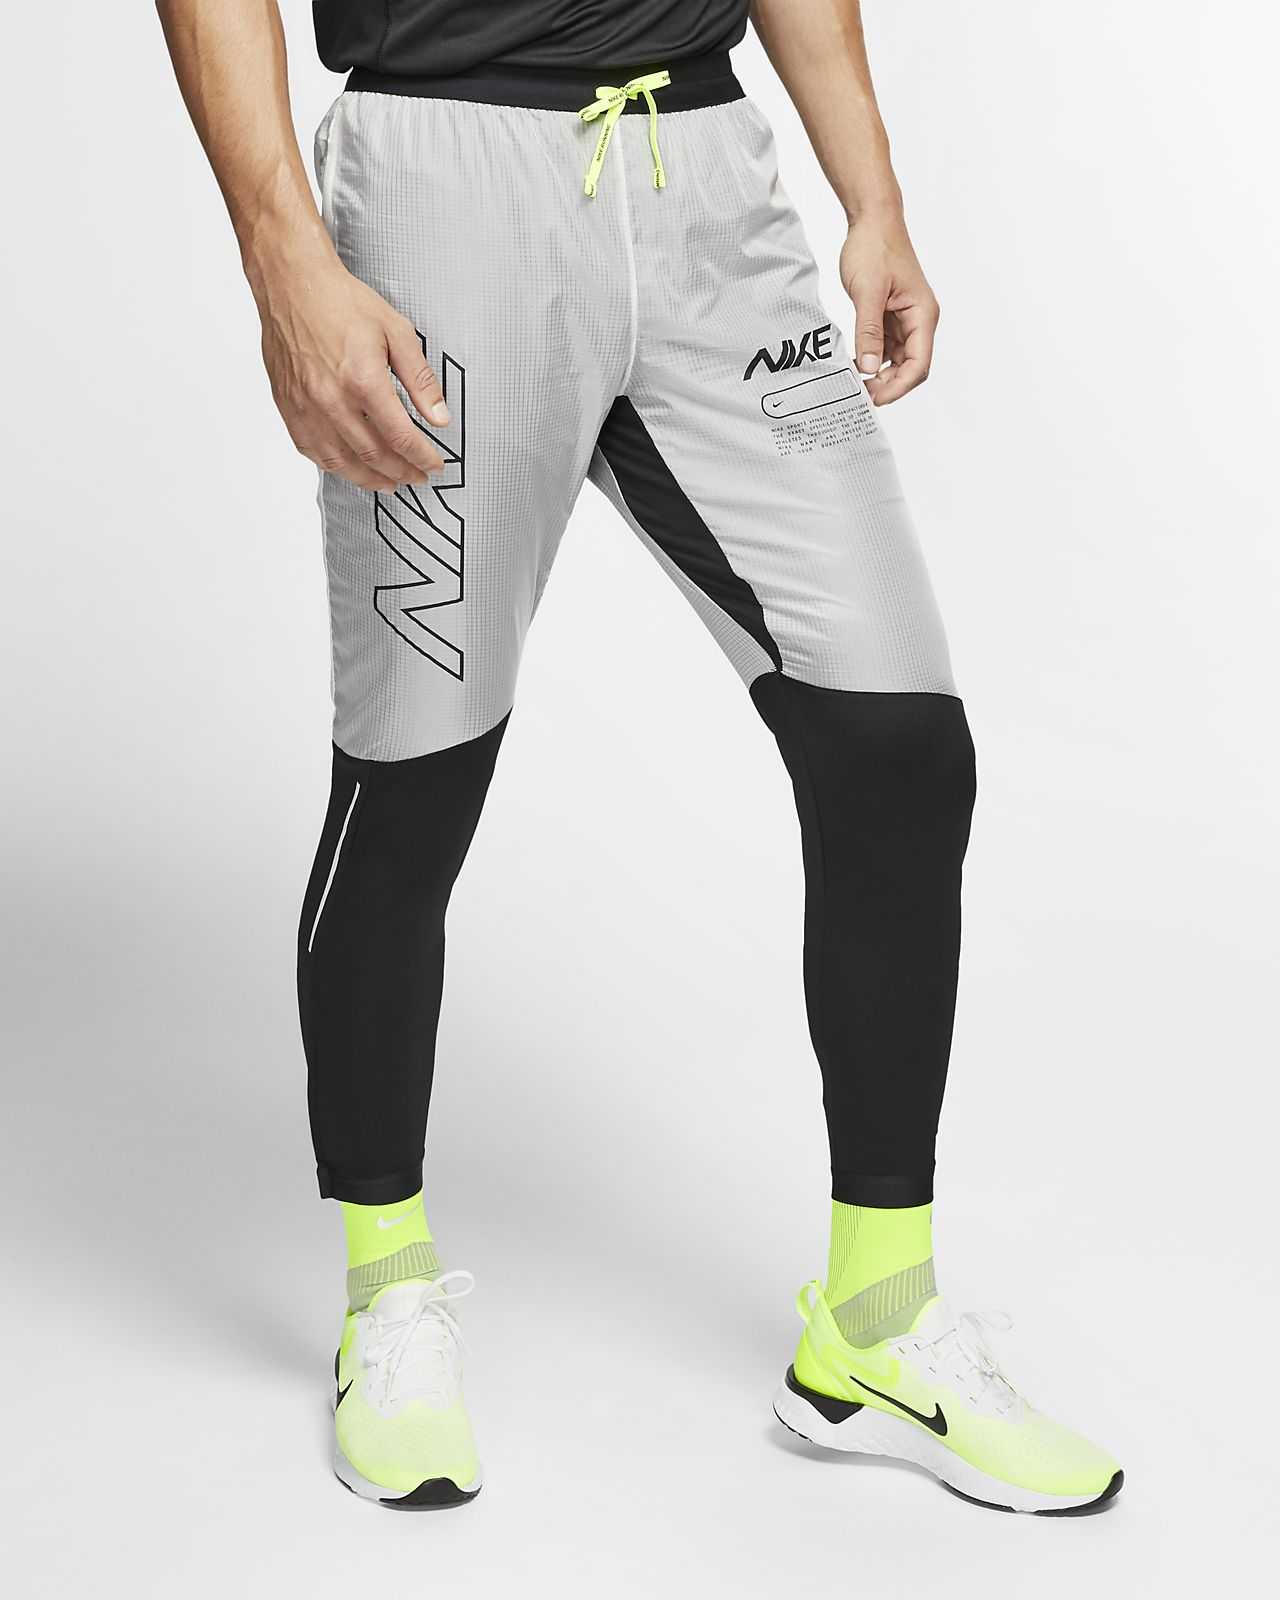 Nike Phenom Men's Track Running Pants